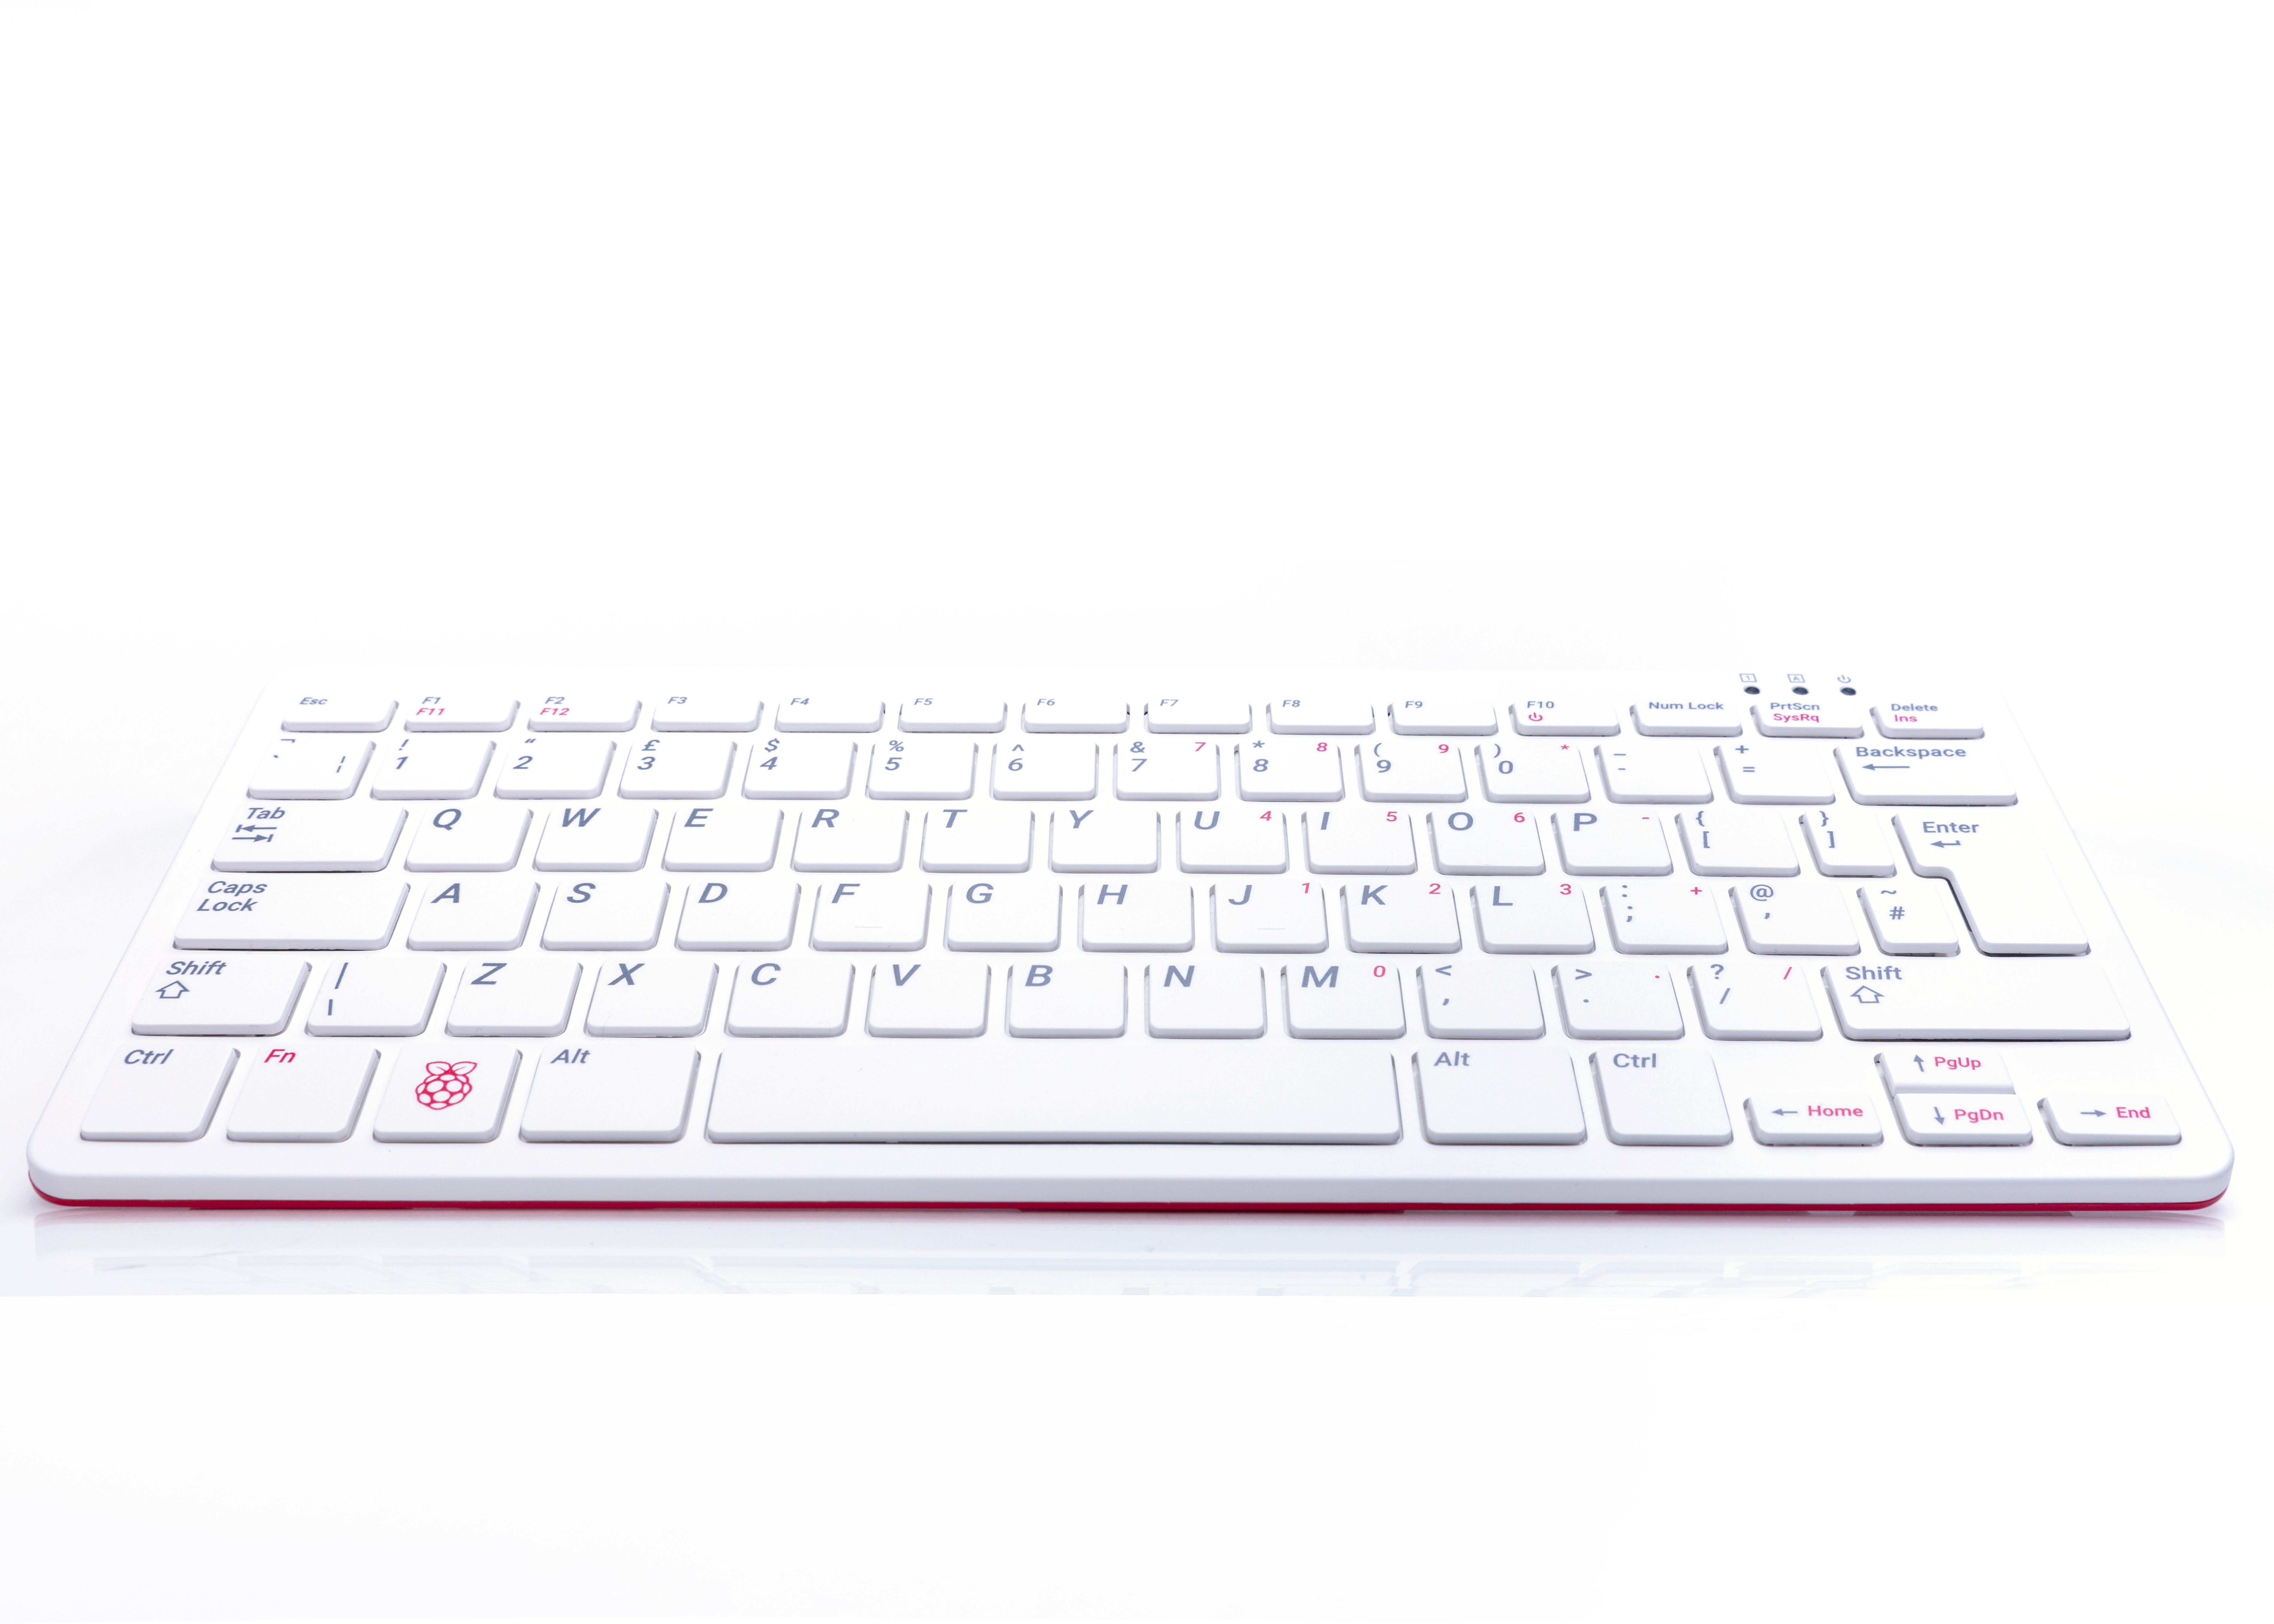 Raspberry Pi 400 UK Keyboard Layout - Computer Only